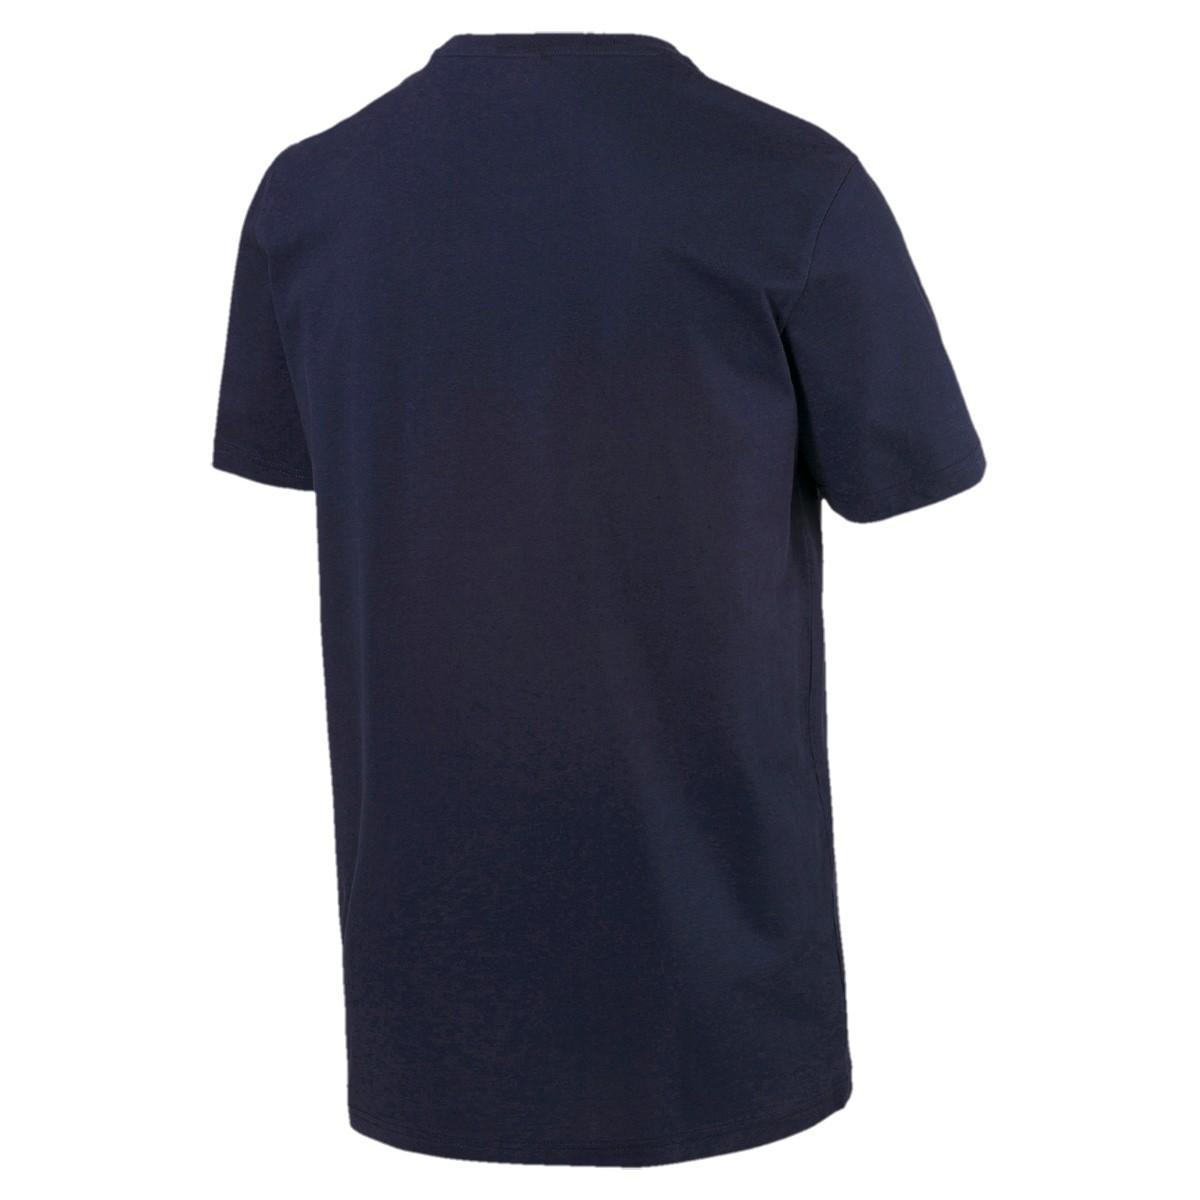 Camiseta Puma Box Marinho - Masculina